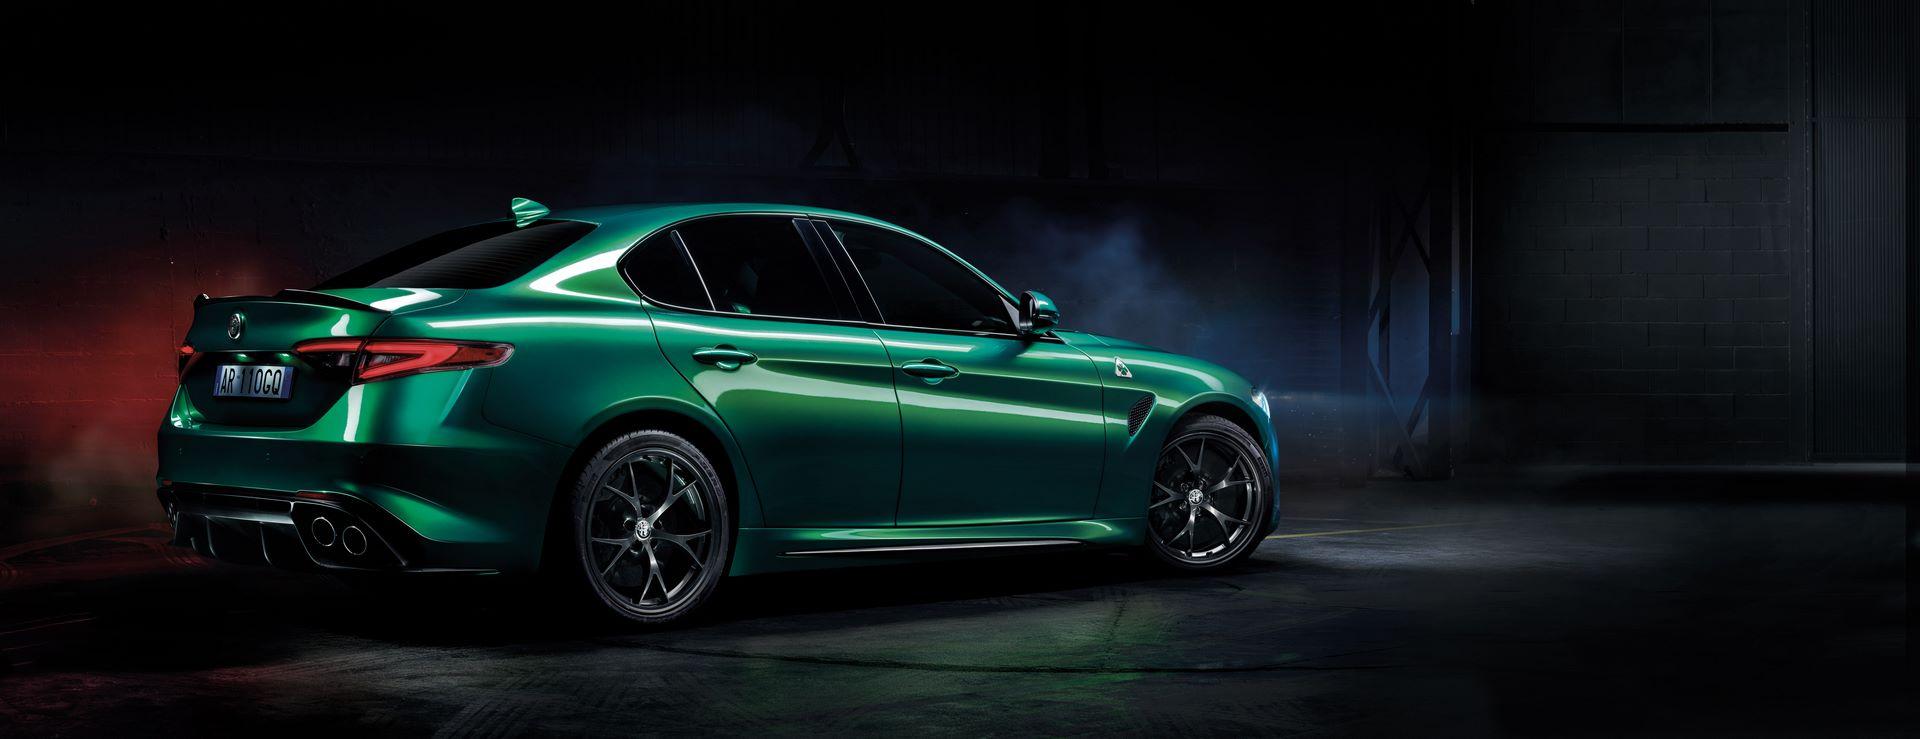 Alfa-Romeo-Giulia-Quadrifoglio-Stelvio-Quadrifoglio-facelift-2020-12